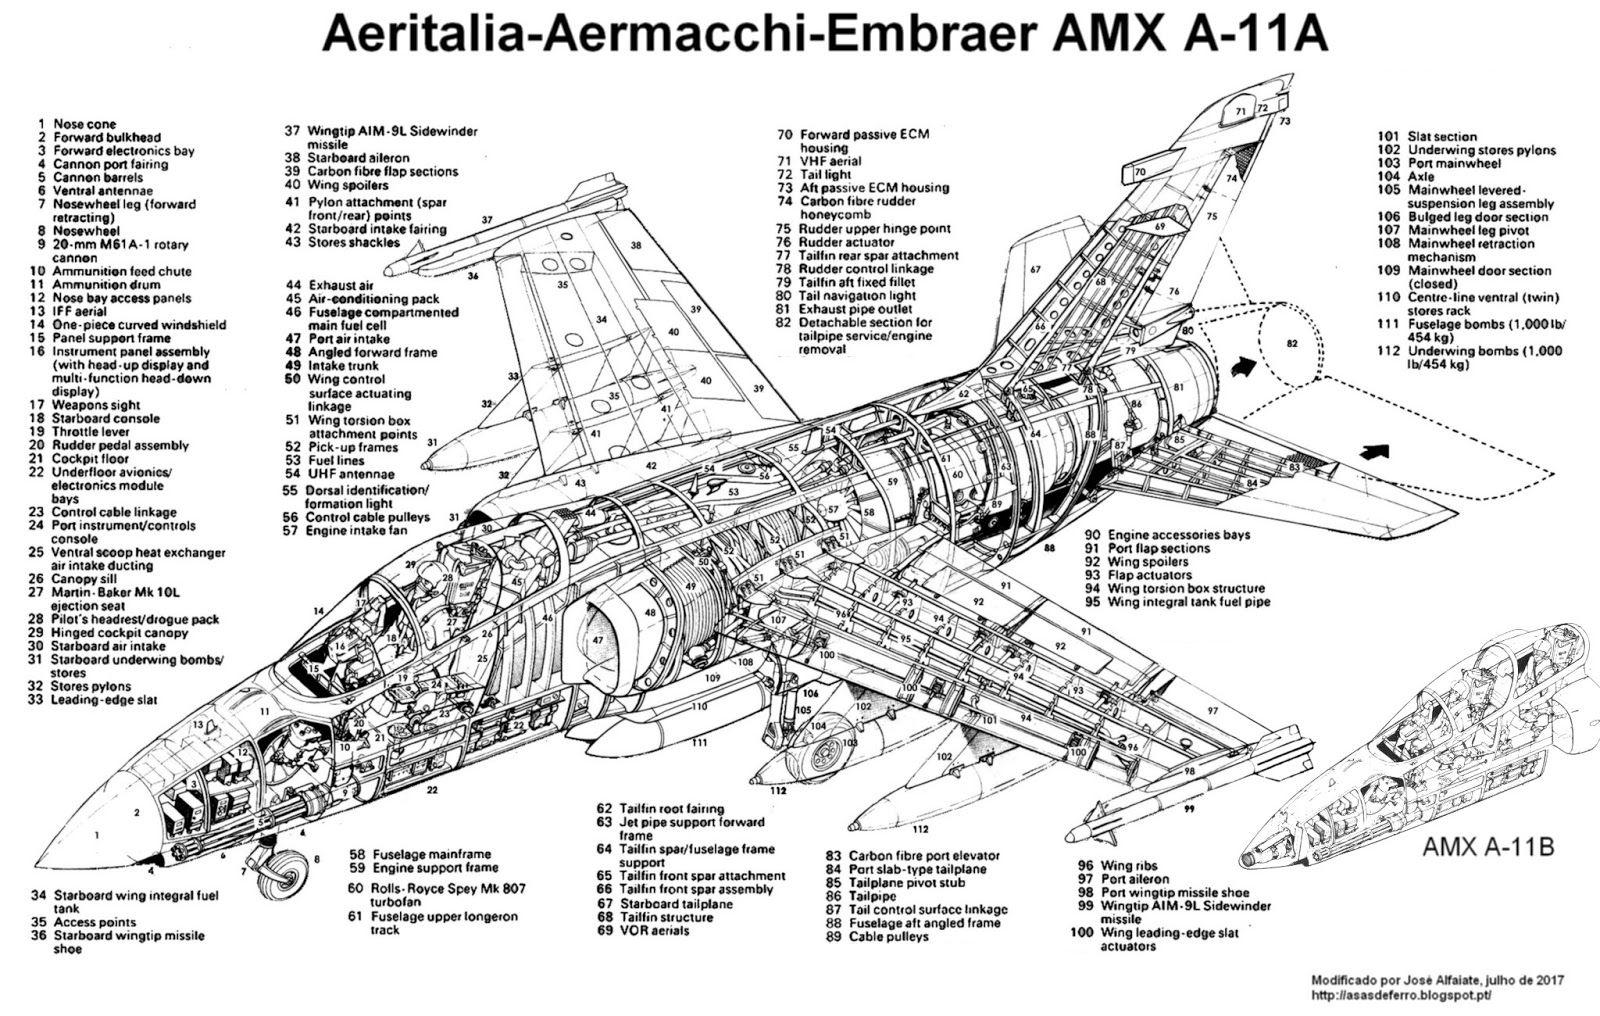 Avioes Militares Amx